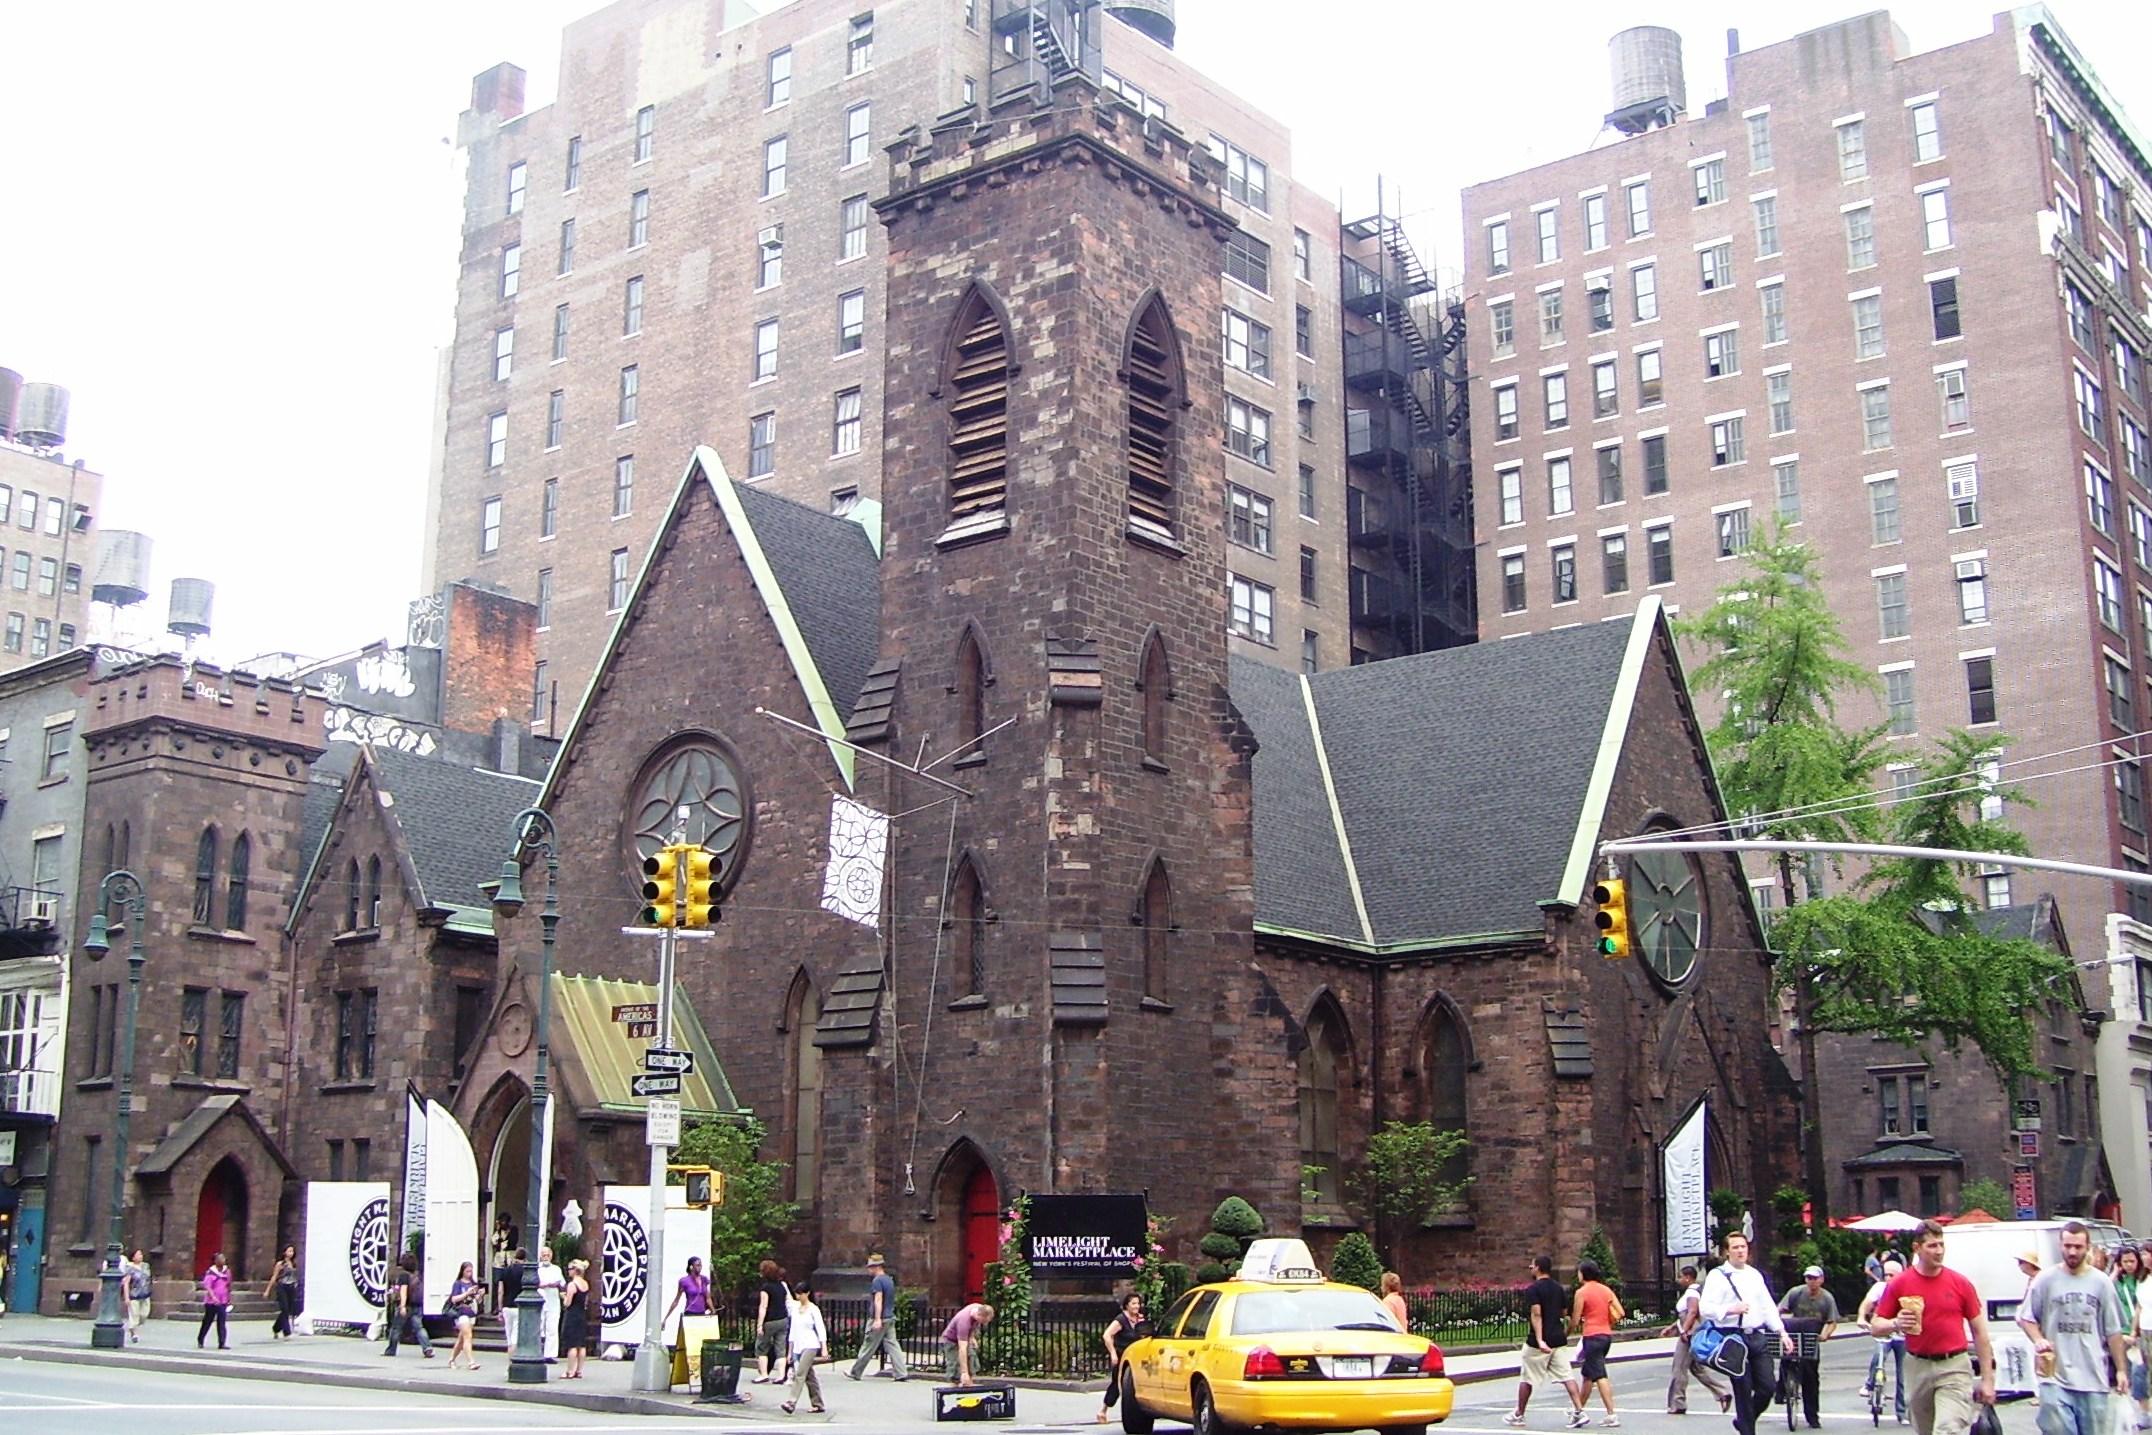 Church Street Nyc Restaurant